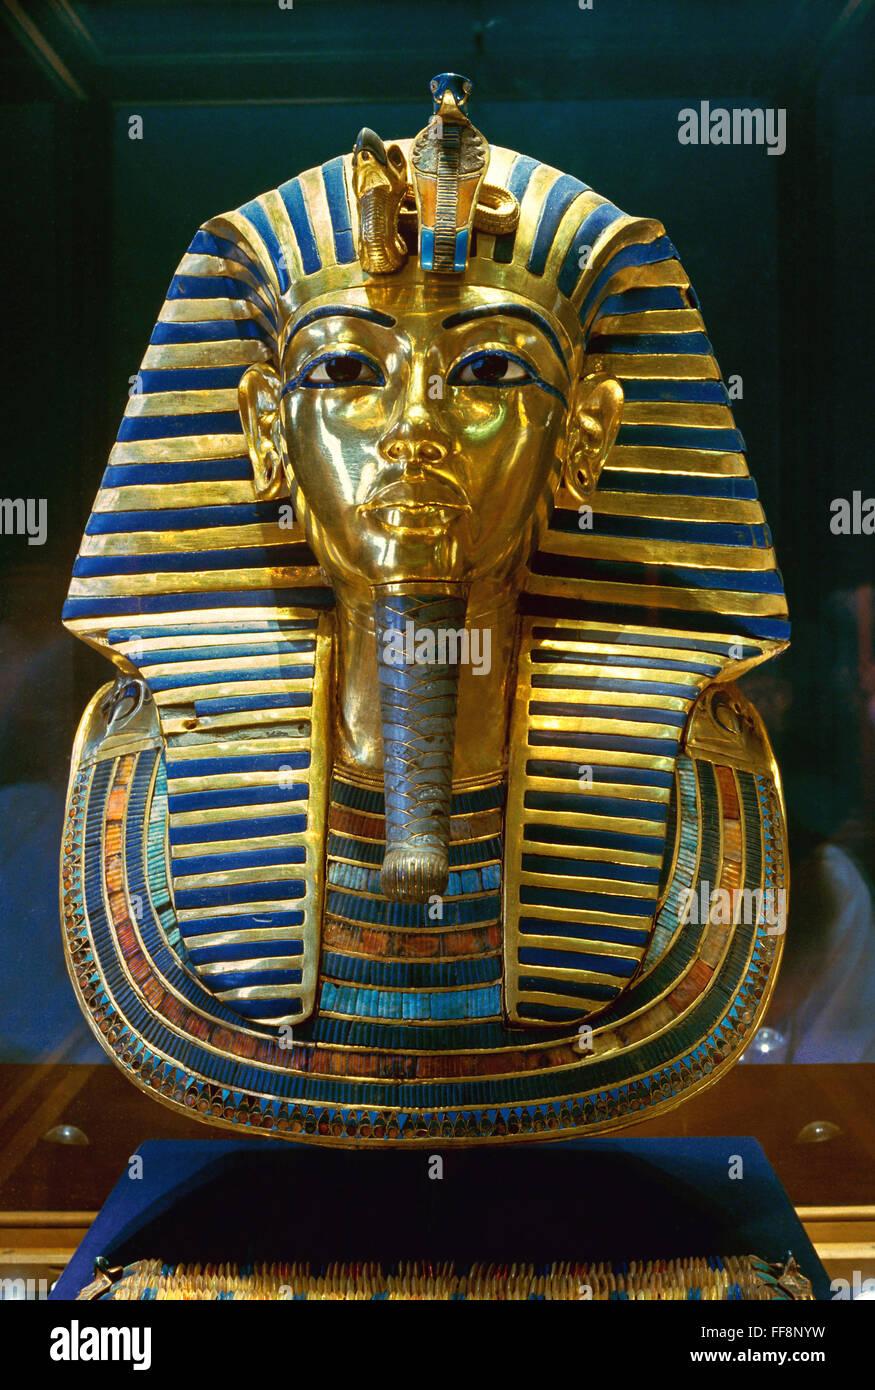 The funerary Mask of Tutankhamun, 14th century BC, Egyptian Museum of Antiquities, Cairo, Egypt, Africa - Stock Image